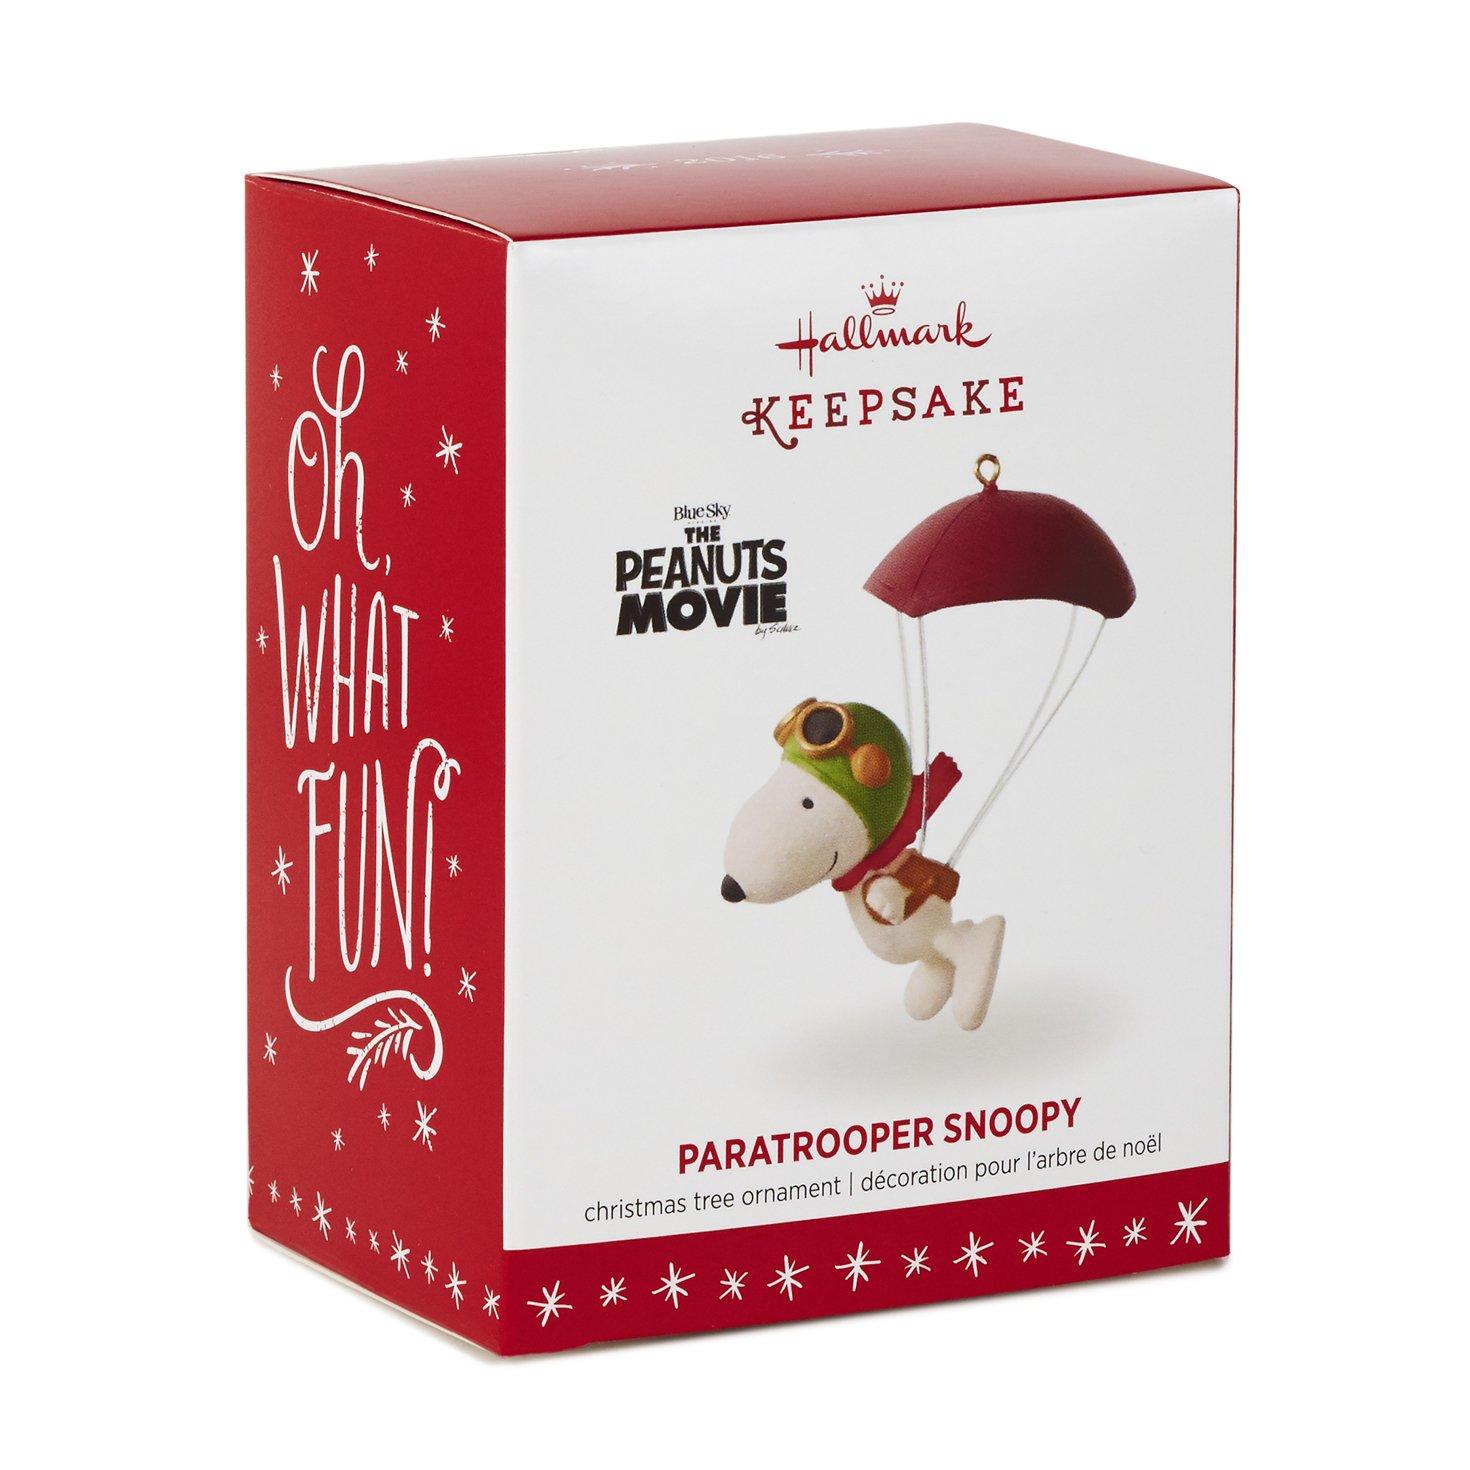 Amazoncom Hallmark Keepsake Spotlight On Snoopy #19 Winter Fun Holiday